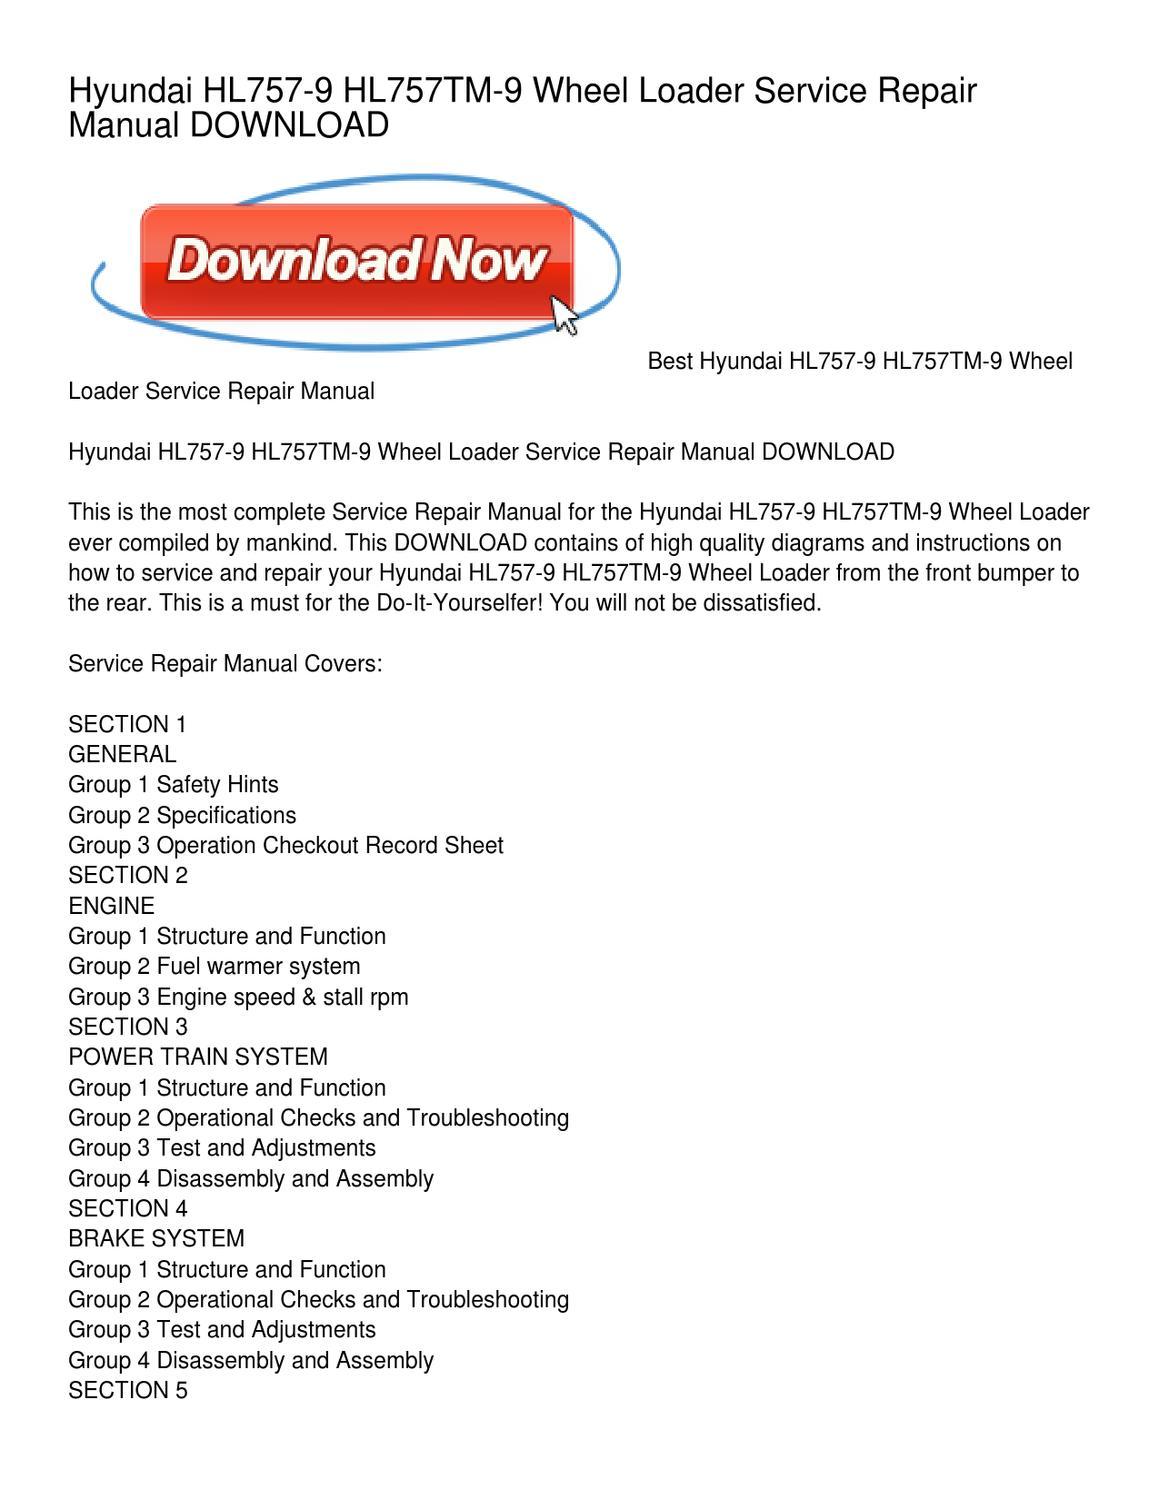 Hyundai HL757-9 HL757TM-9 Wheel Loader Service Repair Manual DOWNLOAD by  Emma Davis - issuu